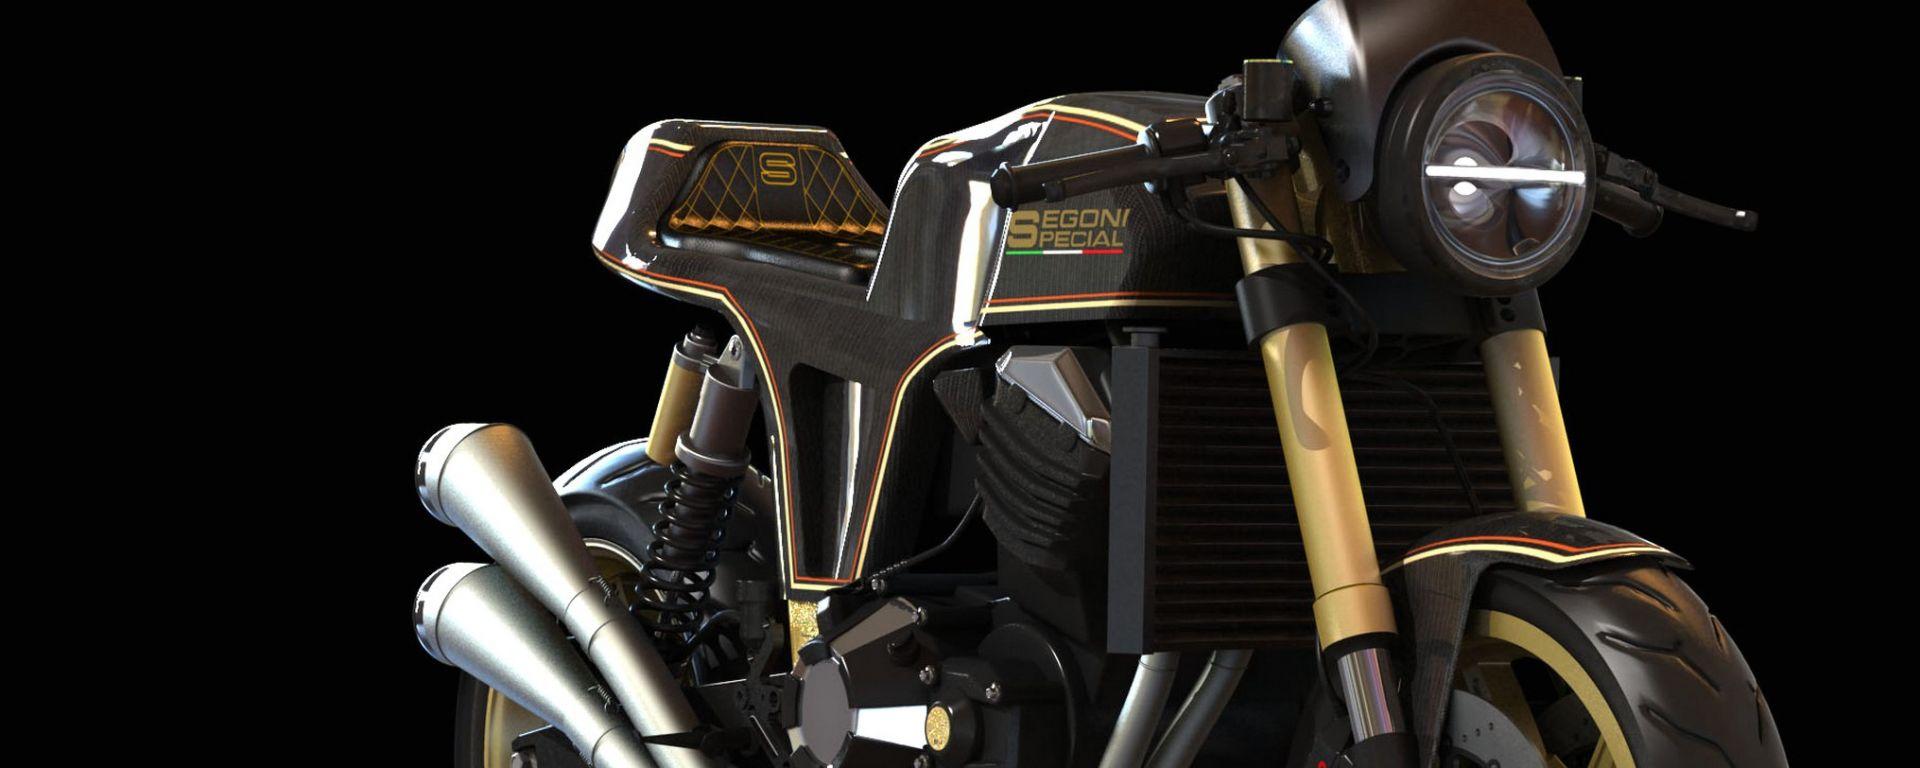 Segoni Special Kawasaki Z800